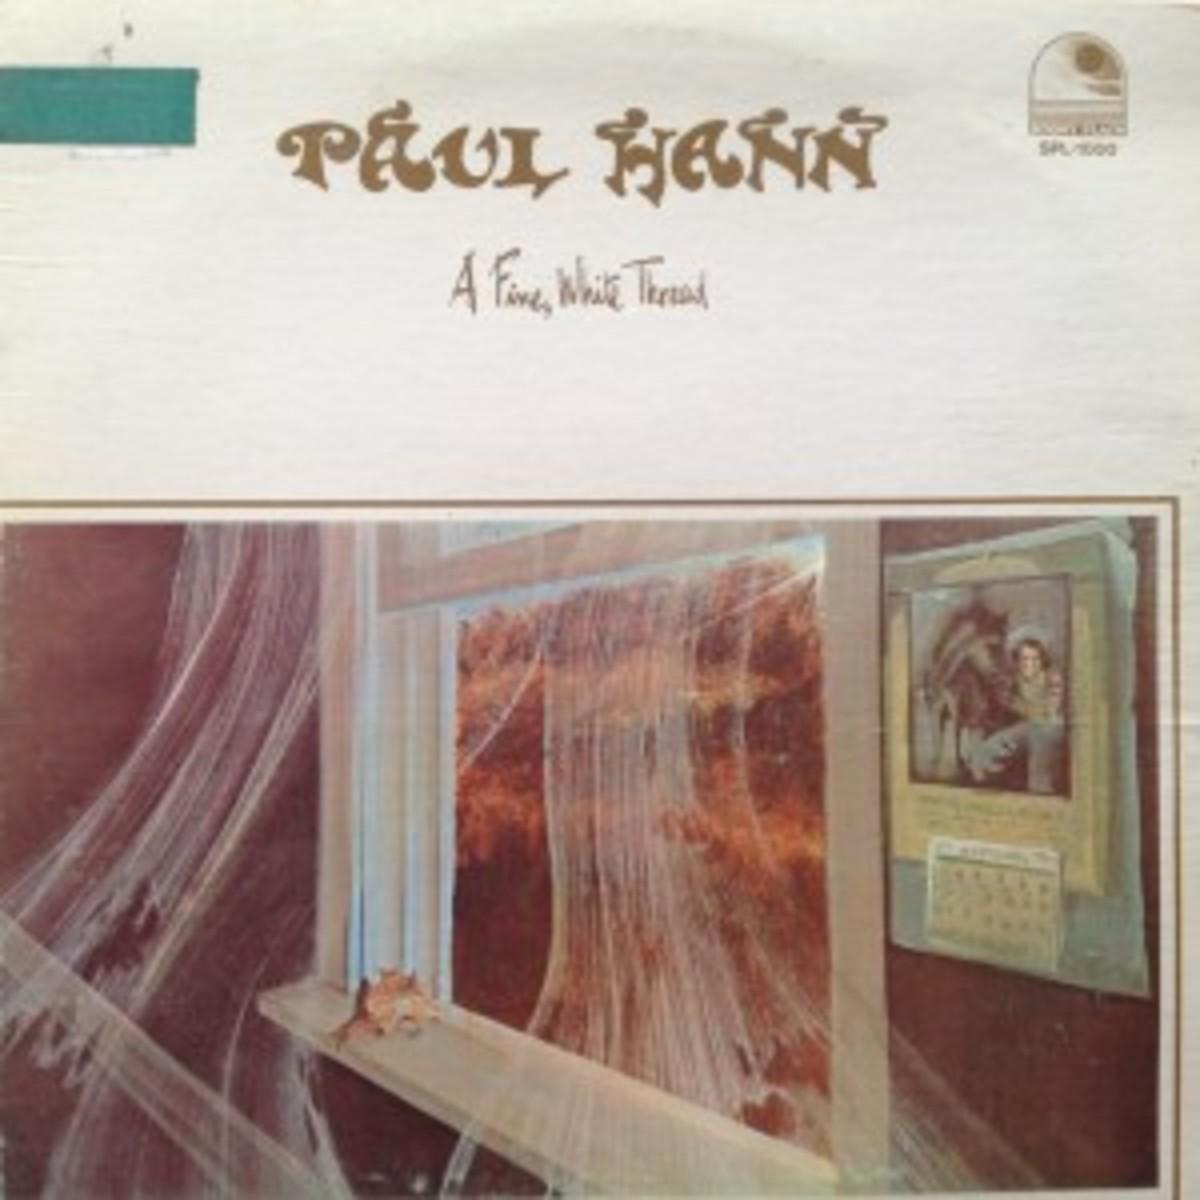 Stony Plain's first release was an album by Paul Hann.